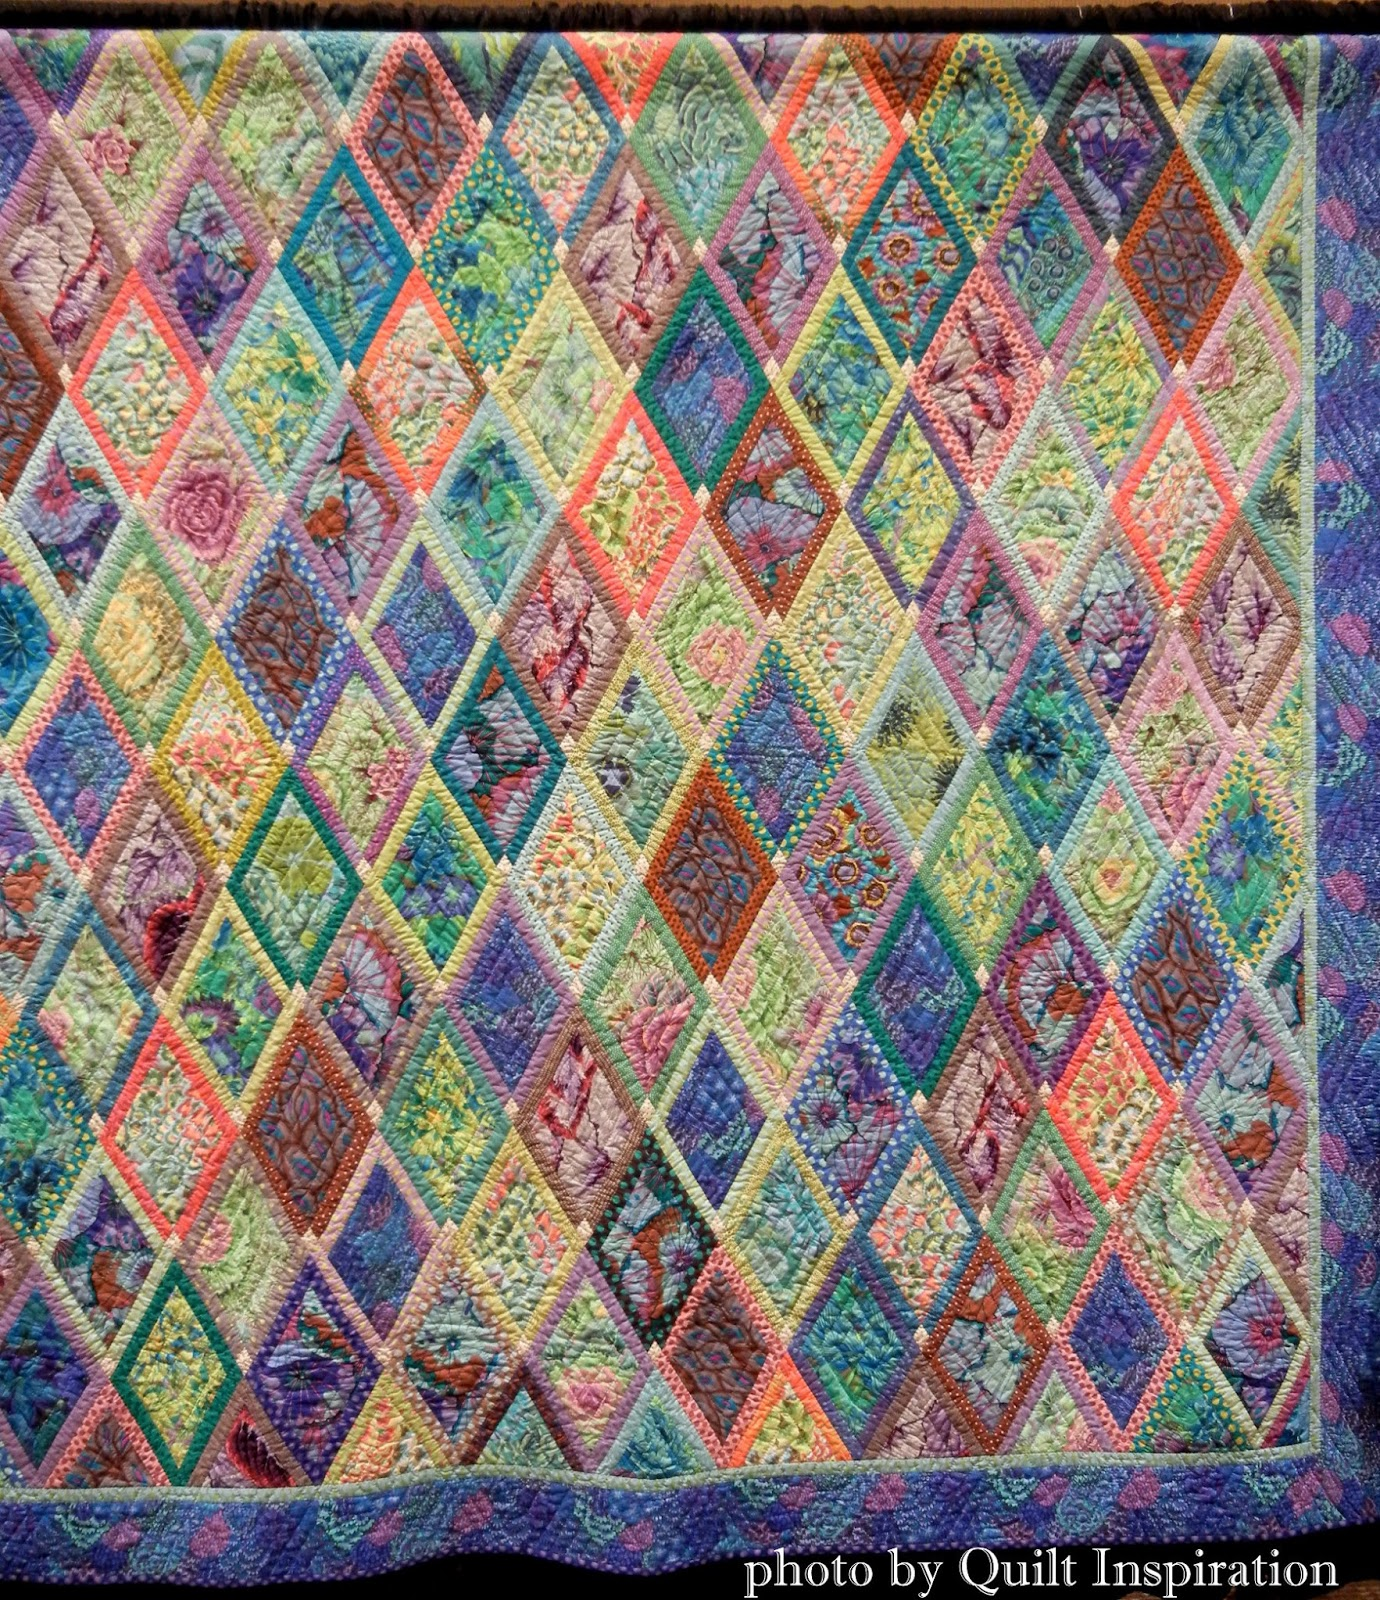 Quilt Patterns And Fabric : Quilt Inspiration: More Kaffe Fassett Quilts